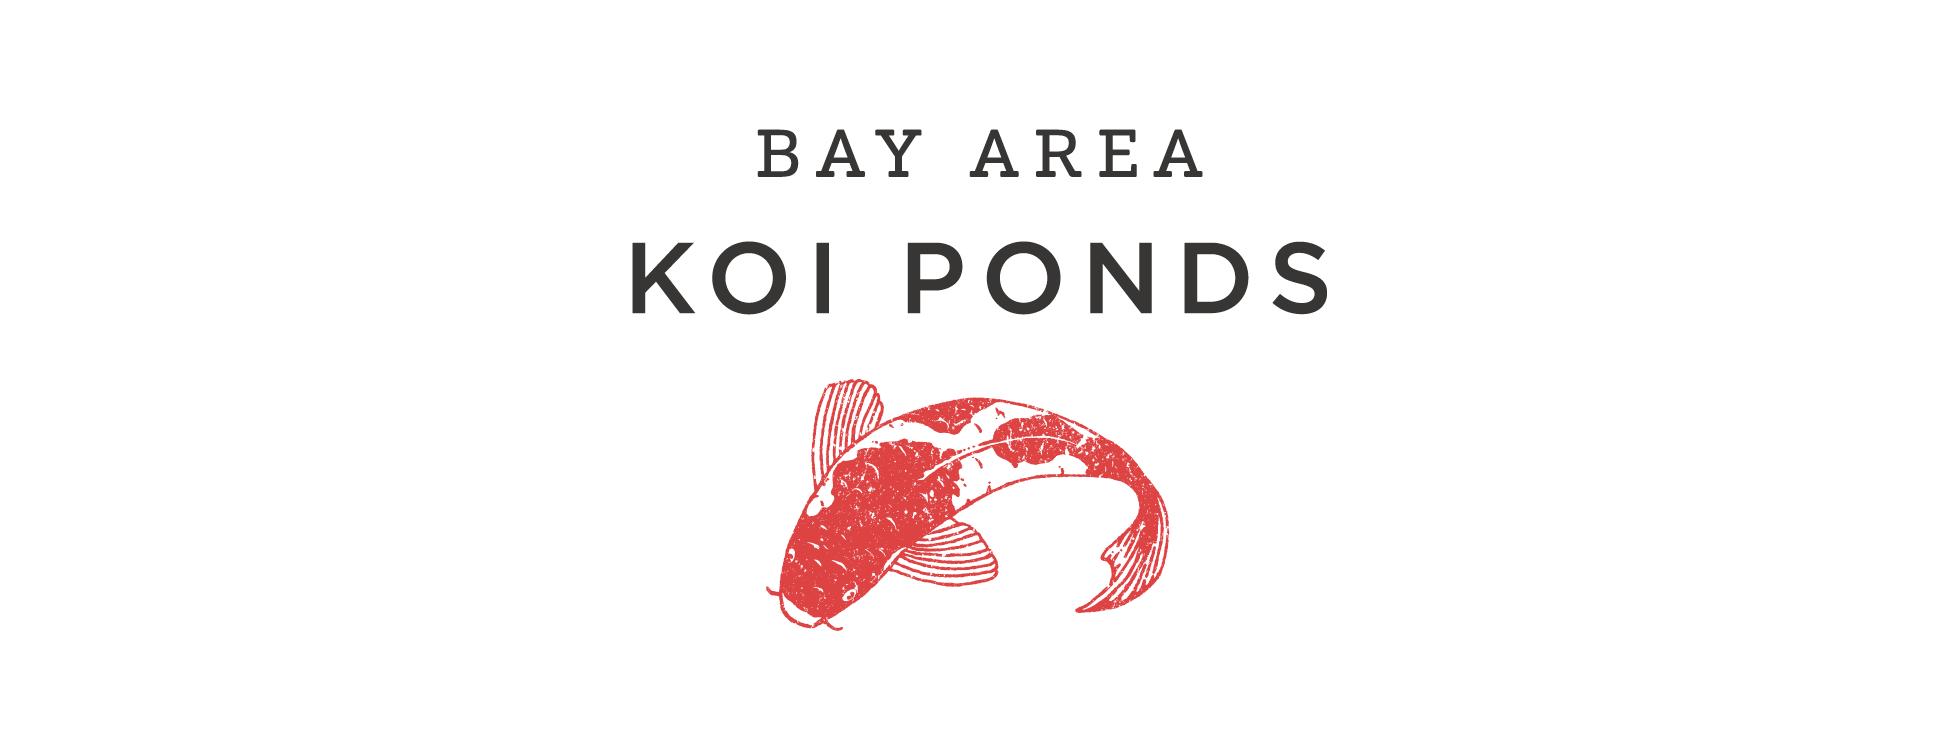 bay area koi pond artwork.png